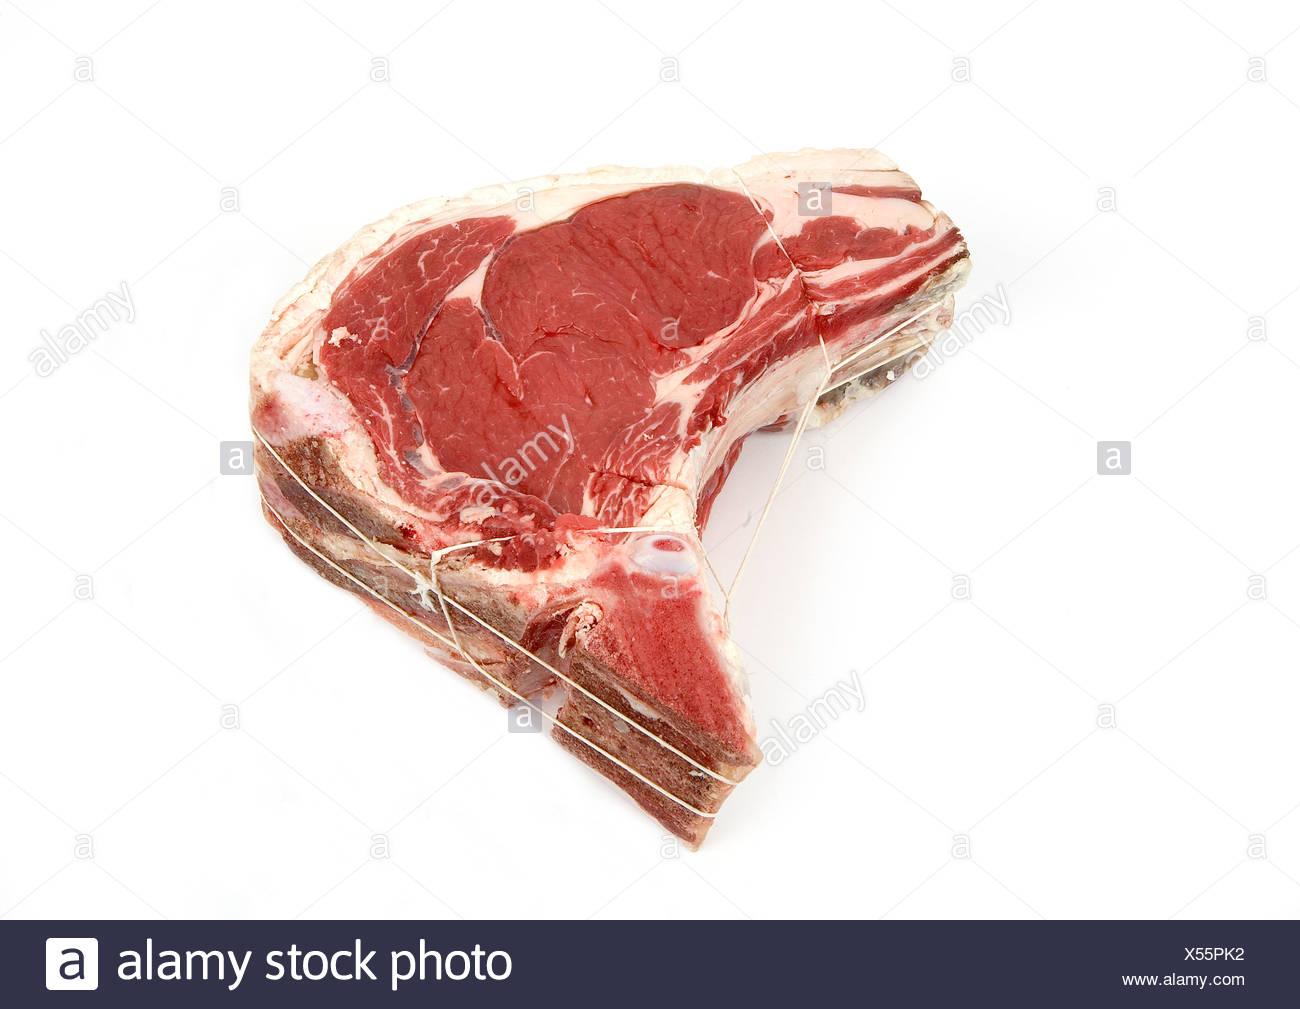 Roastbeef am Knochen Stockbild